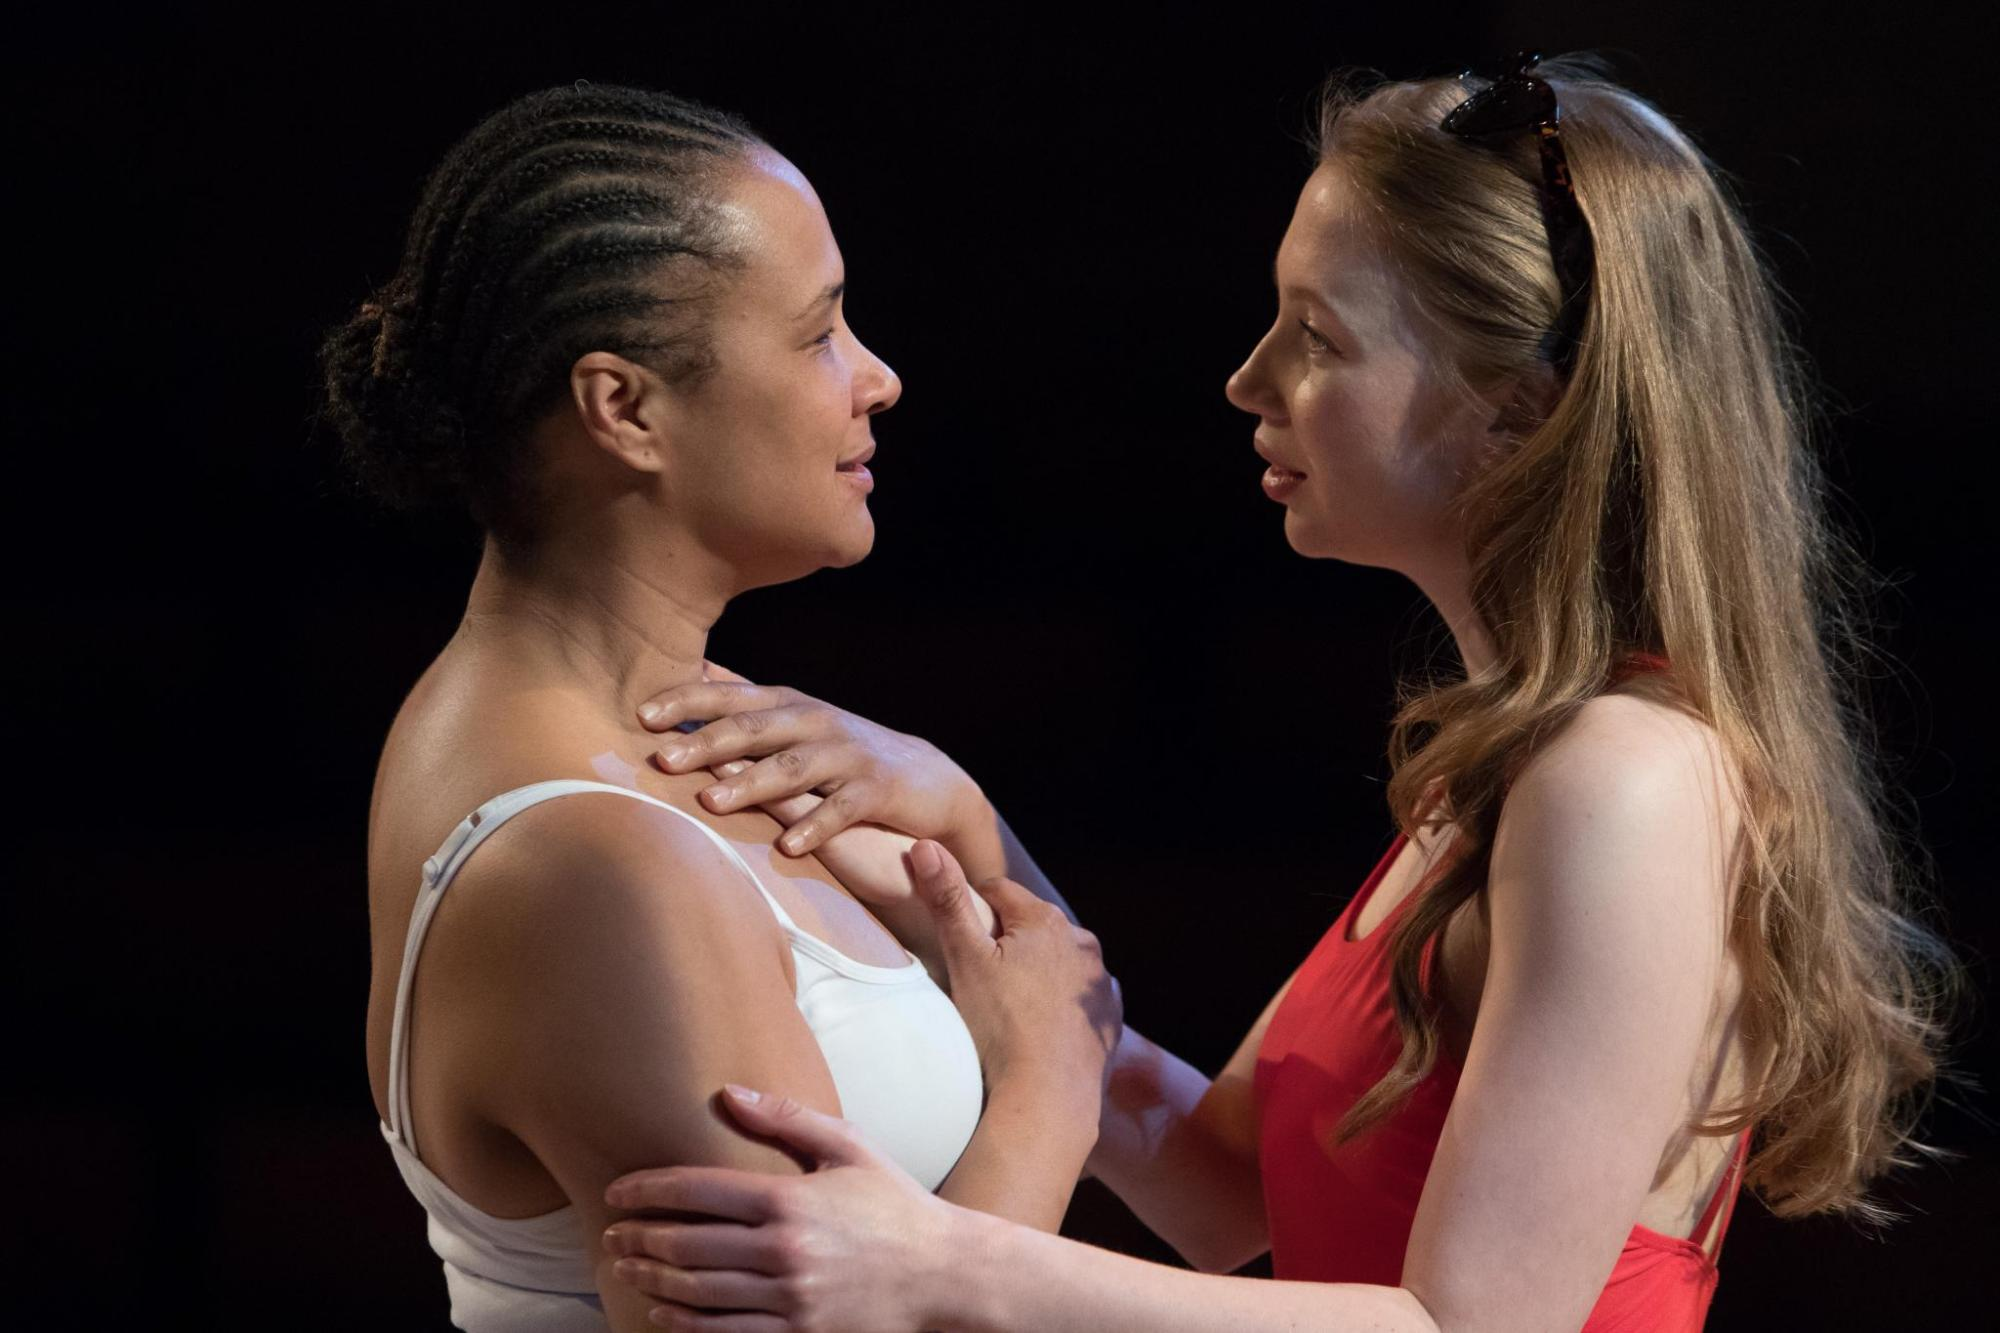 Othello, Golda Rosheuvel as Othello & Emily Hughes as Desdemona JKP-180428-4596.jpg